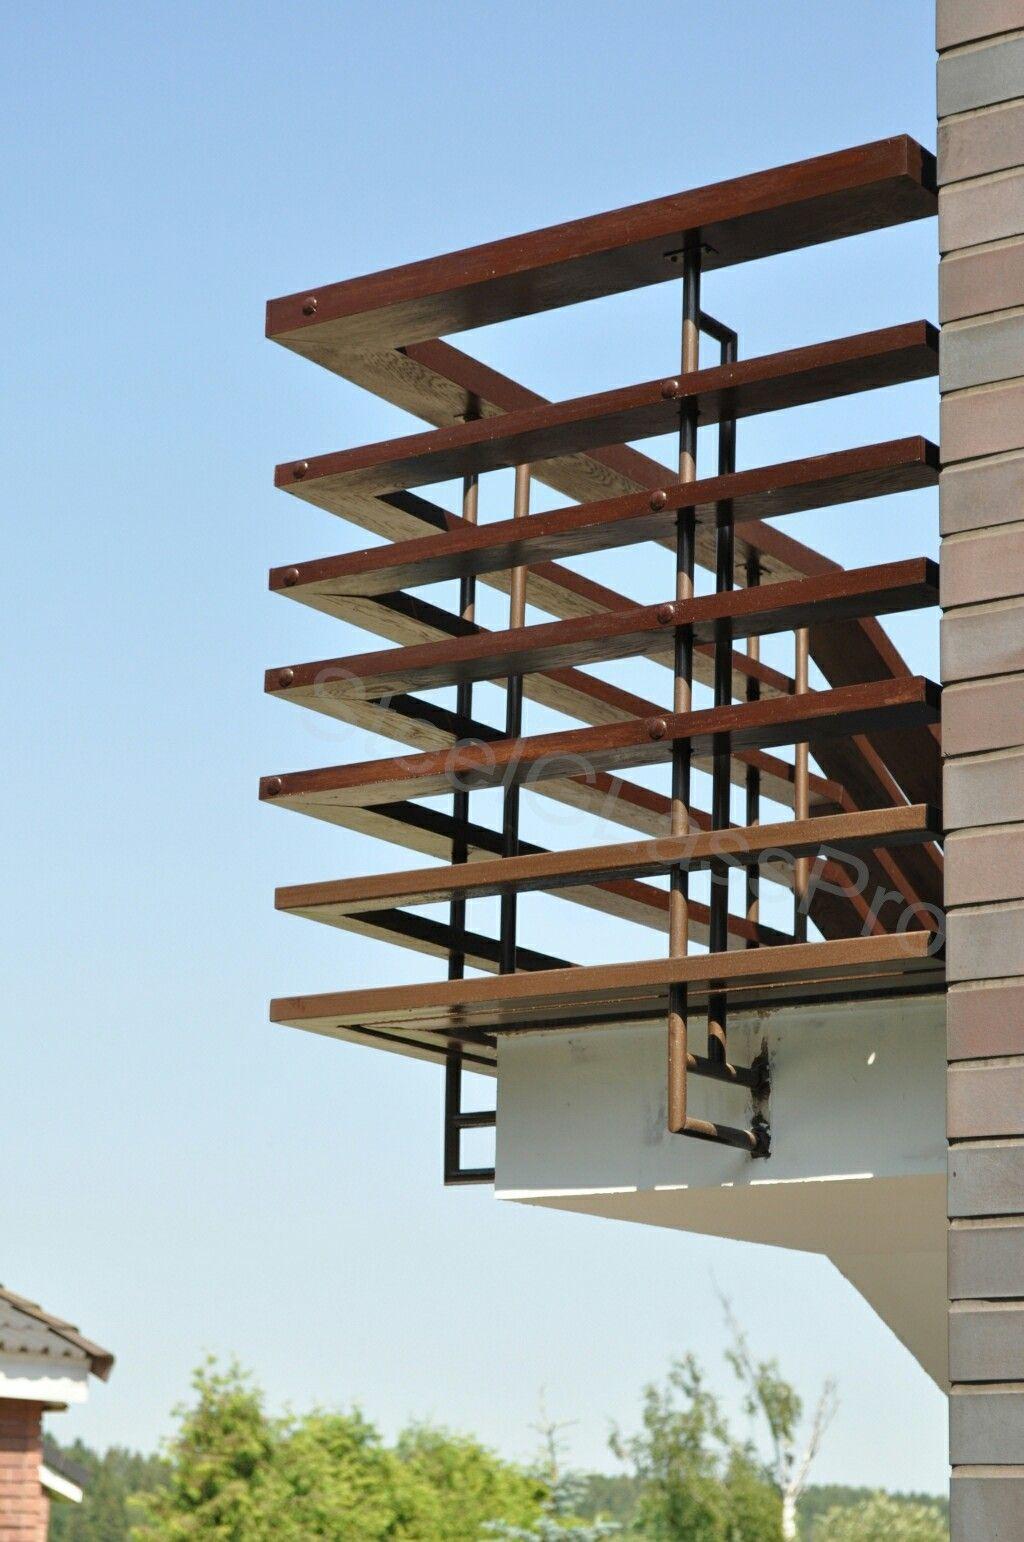 Balcony Window Grill Design: Pin By Julija Cherpak On Балкон